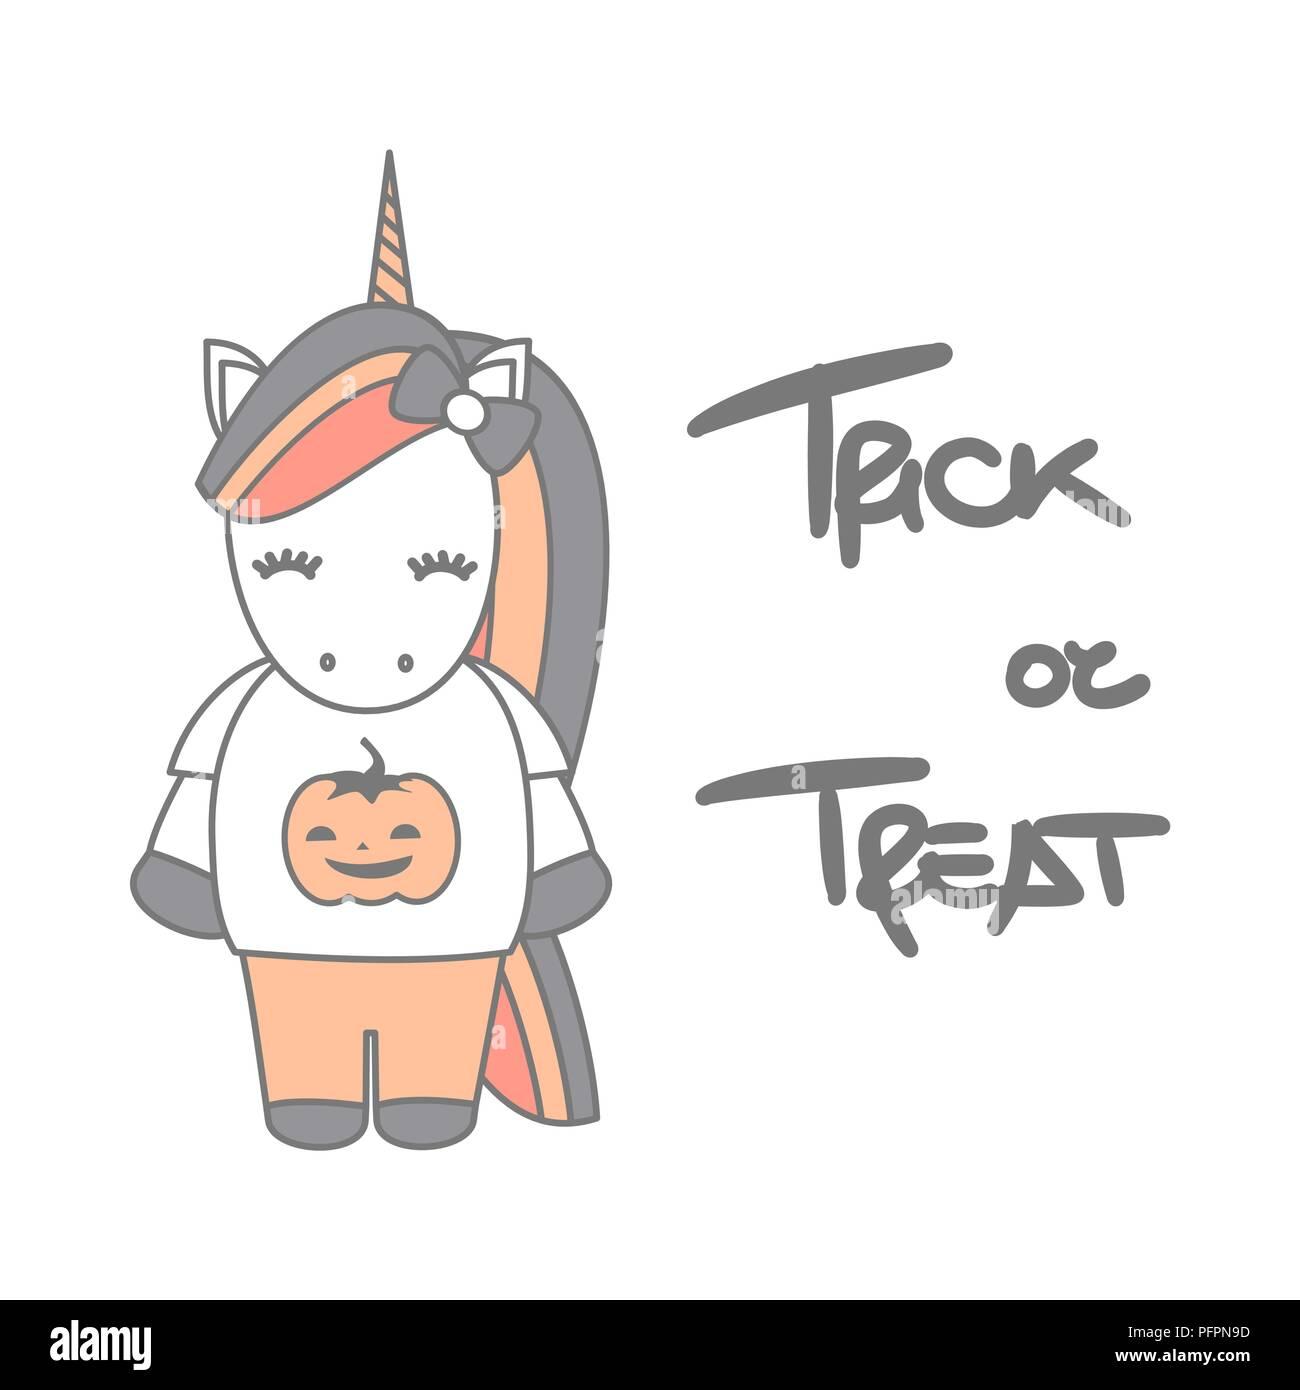 Cute Cartoon Hand Drawn Lettering Trick Or Treat Halloween